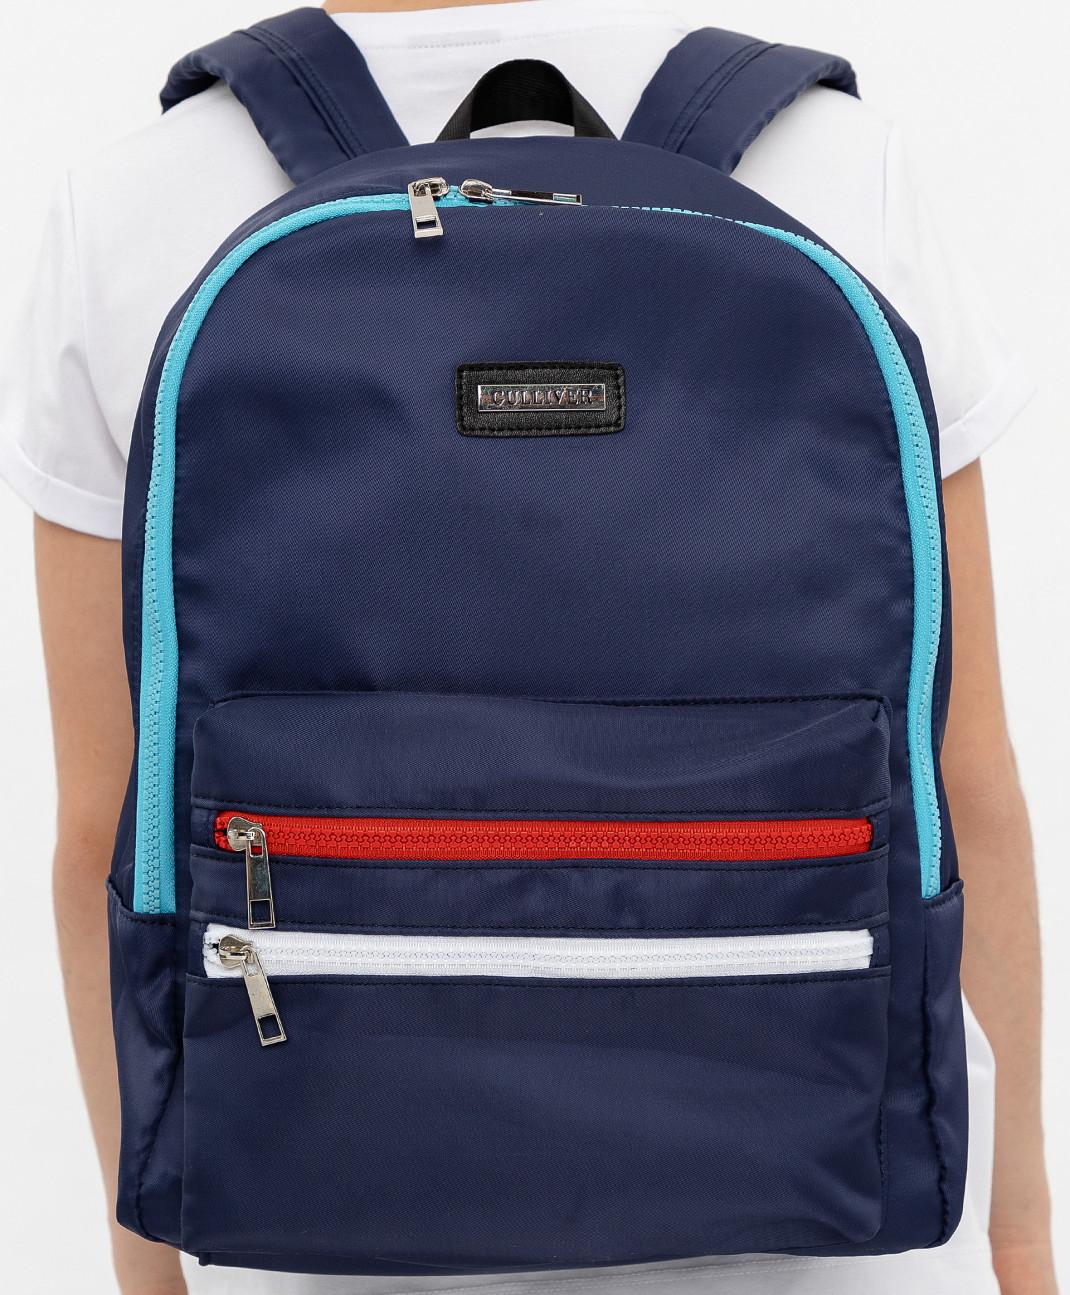 Gulliver Синий рюкзак Gulliver